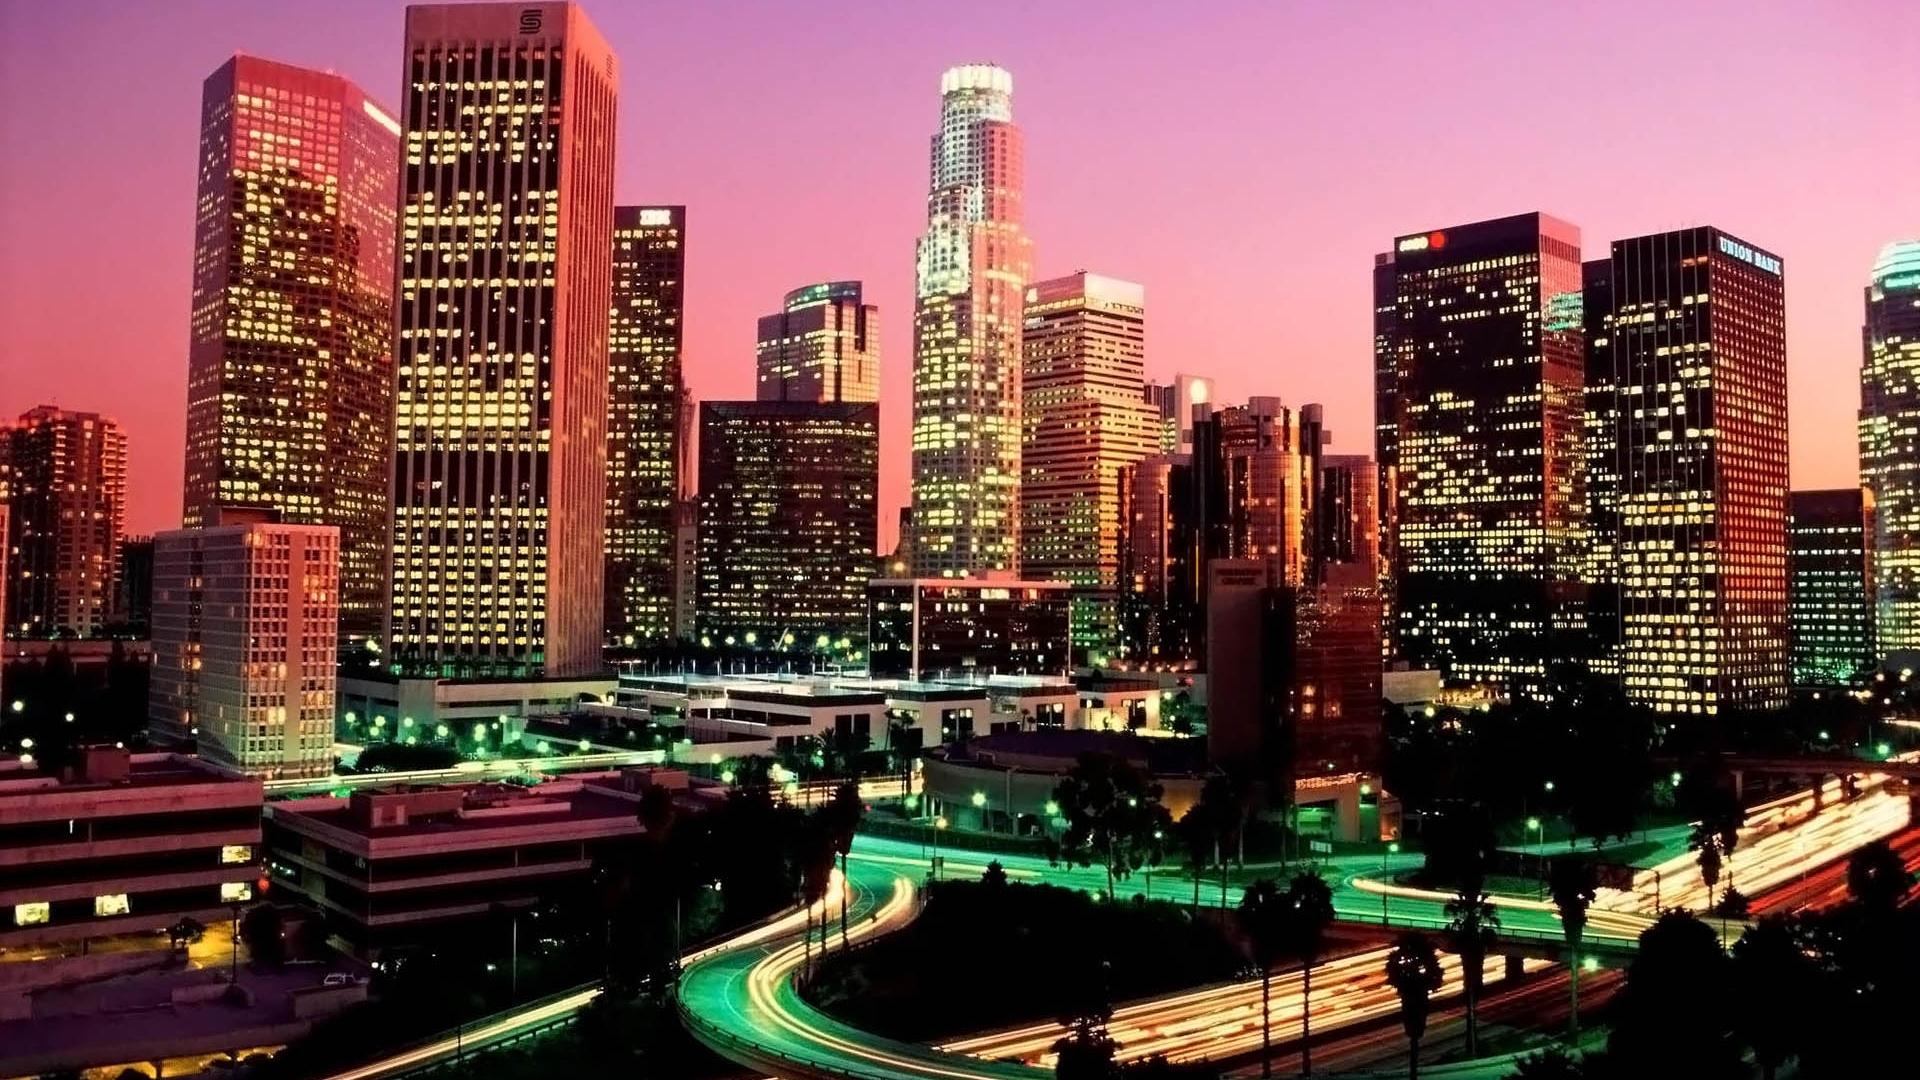 Wallpaper Los Angeles Skyscrapers Night Road